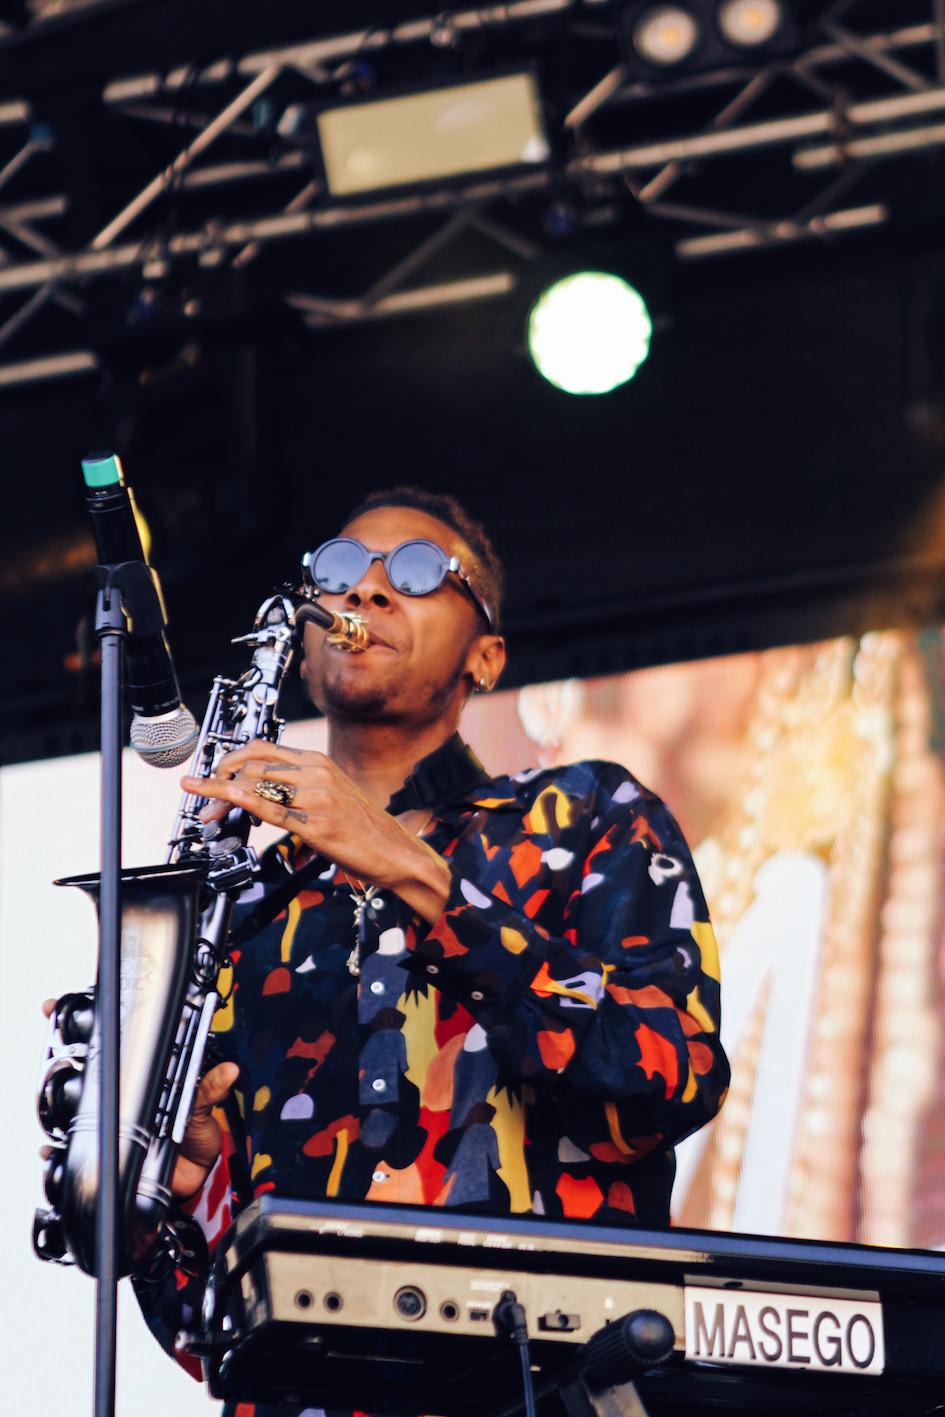 THE CUT | LANEWAY FESTIVAL 2019 MASEGO